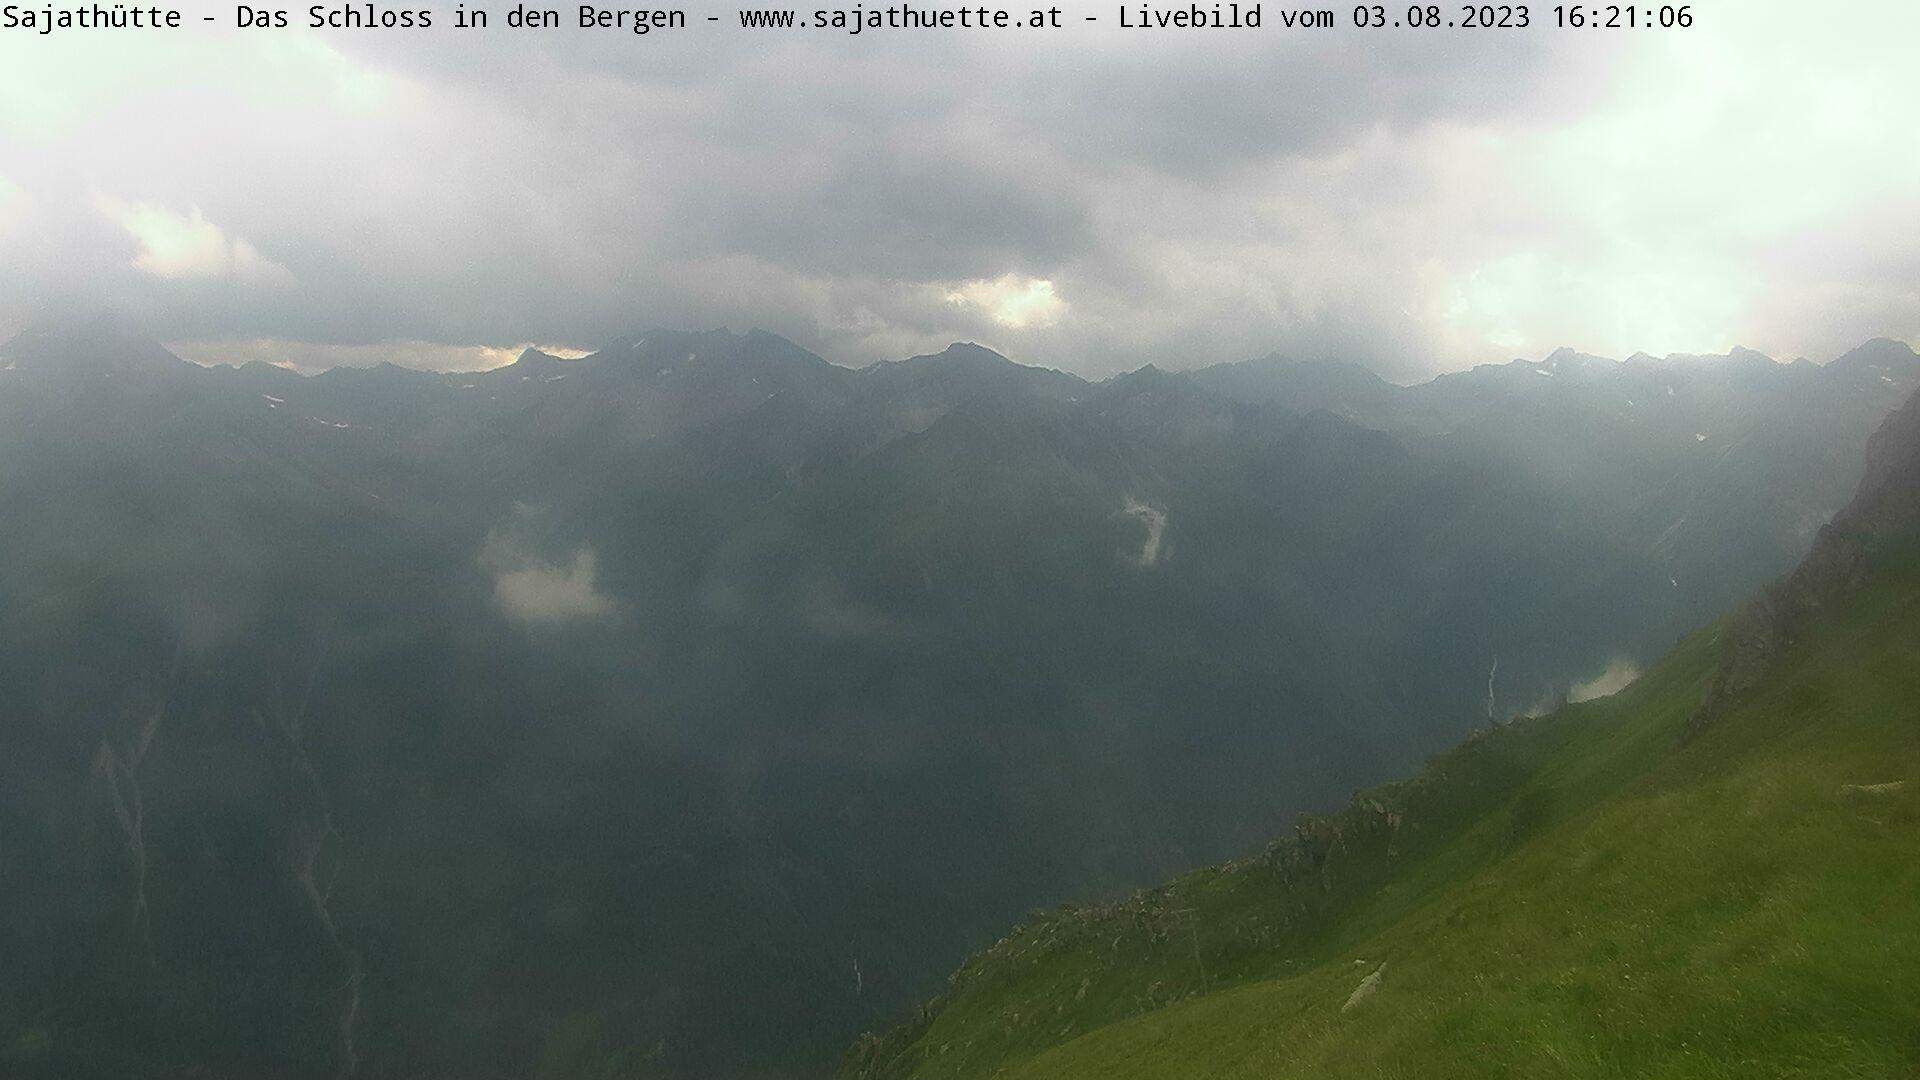 Webcam Blick Richtung Lasörlinggruppe (Süd) | Webcam Sajat-Hütte 2.600 m